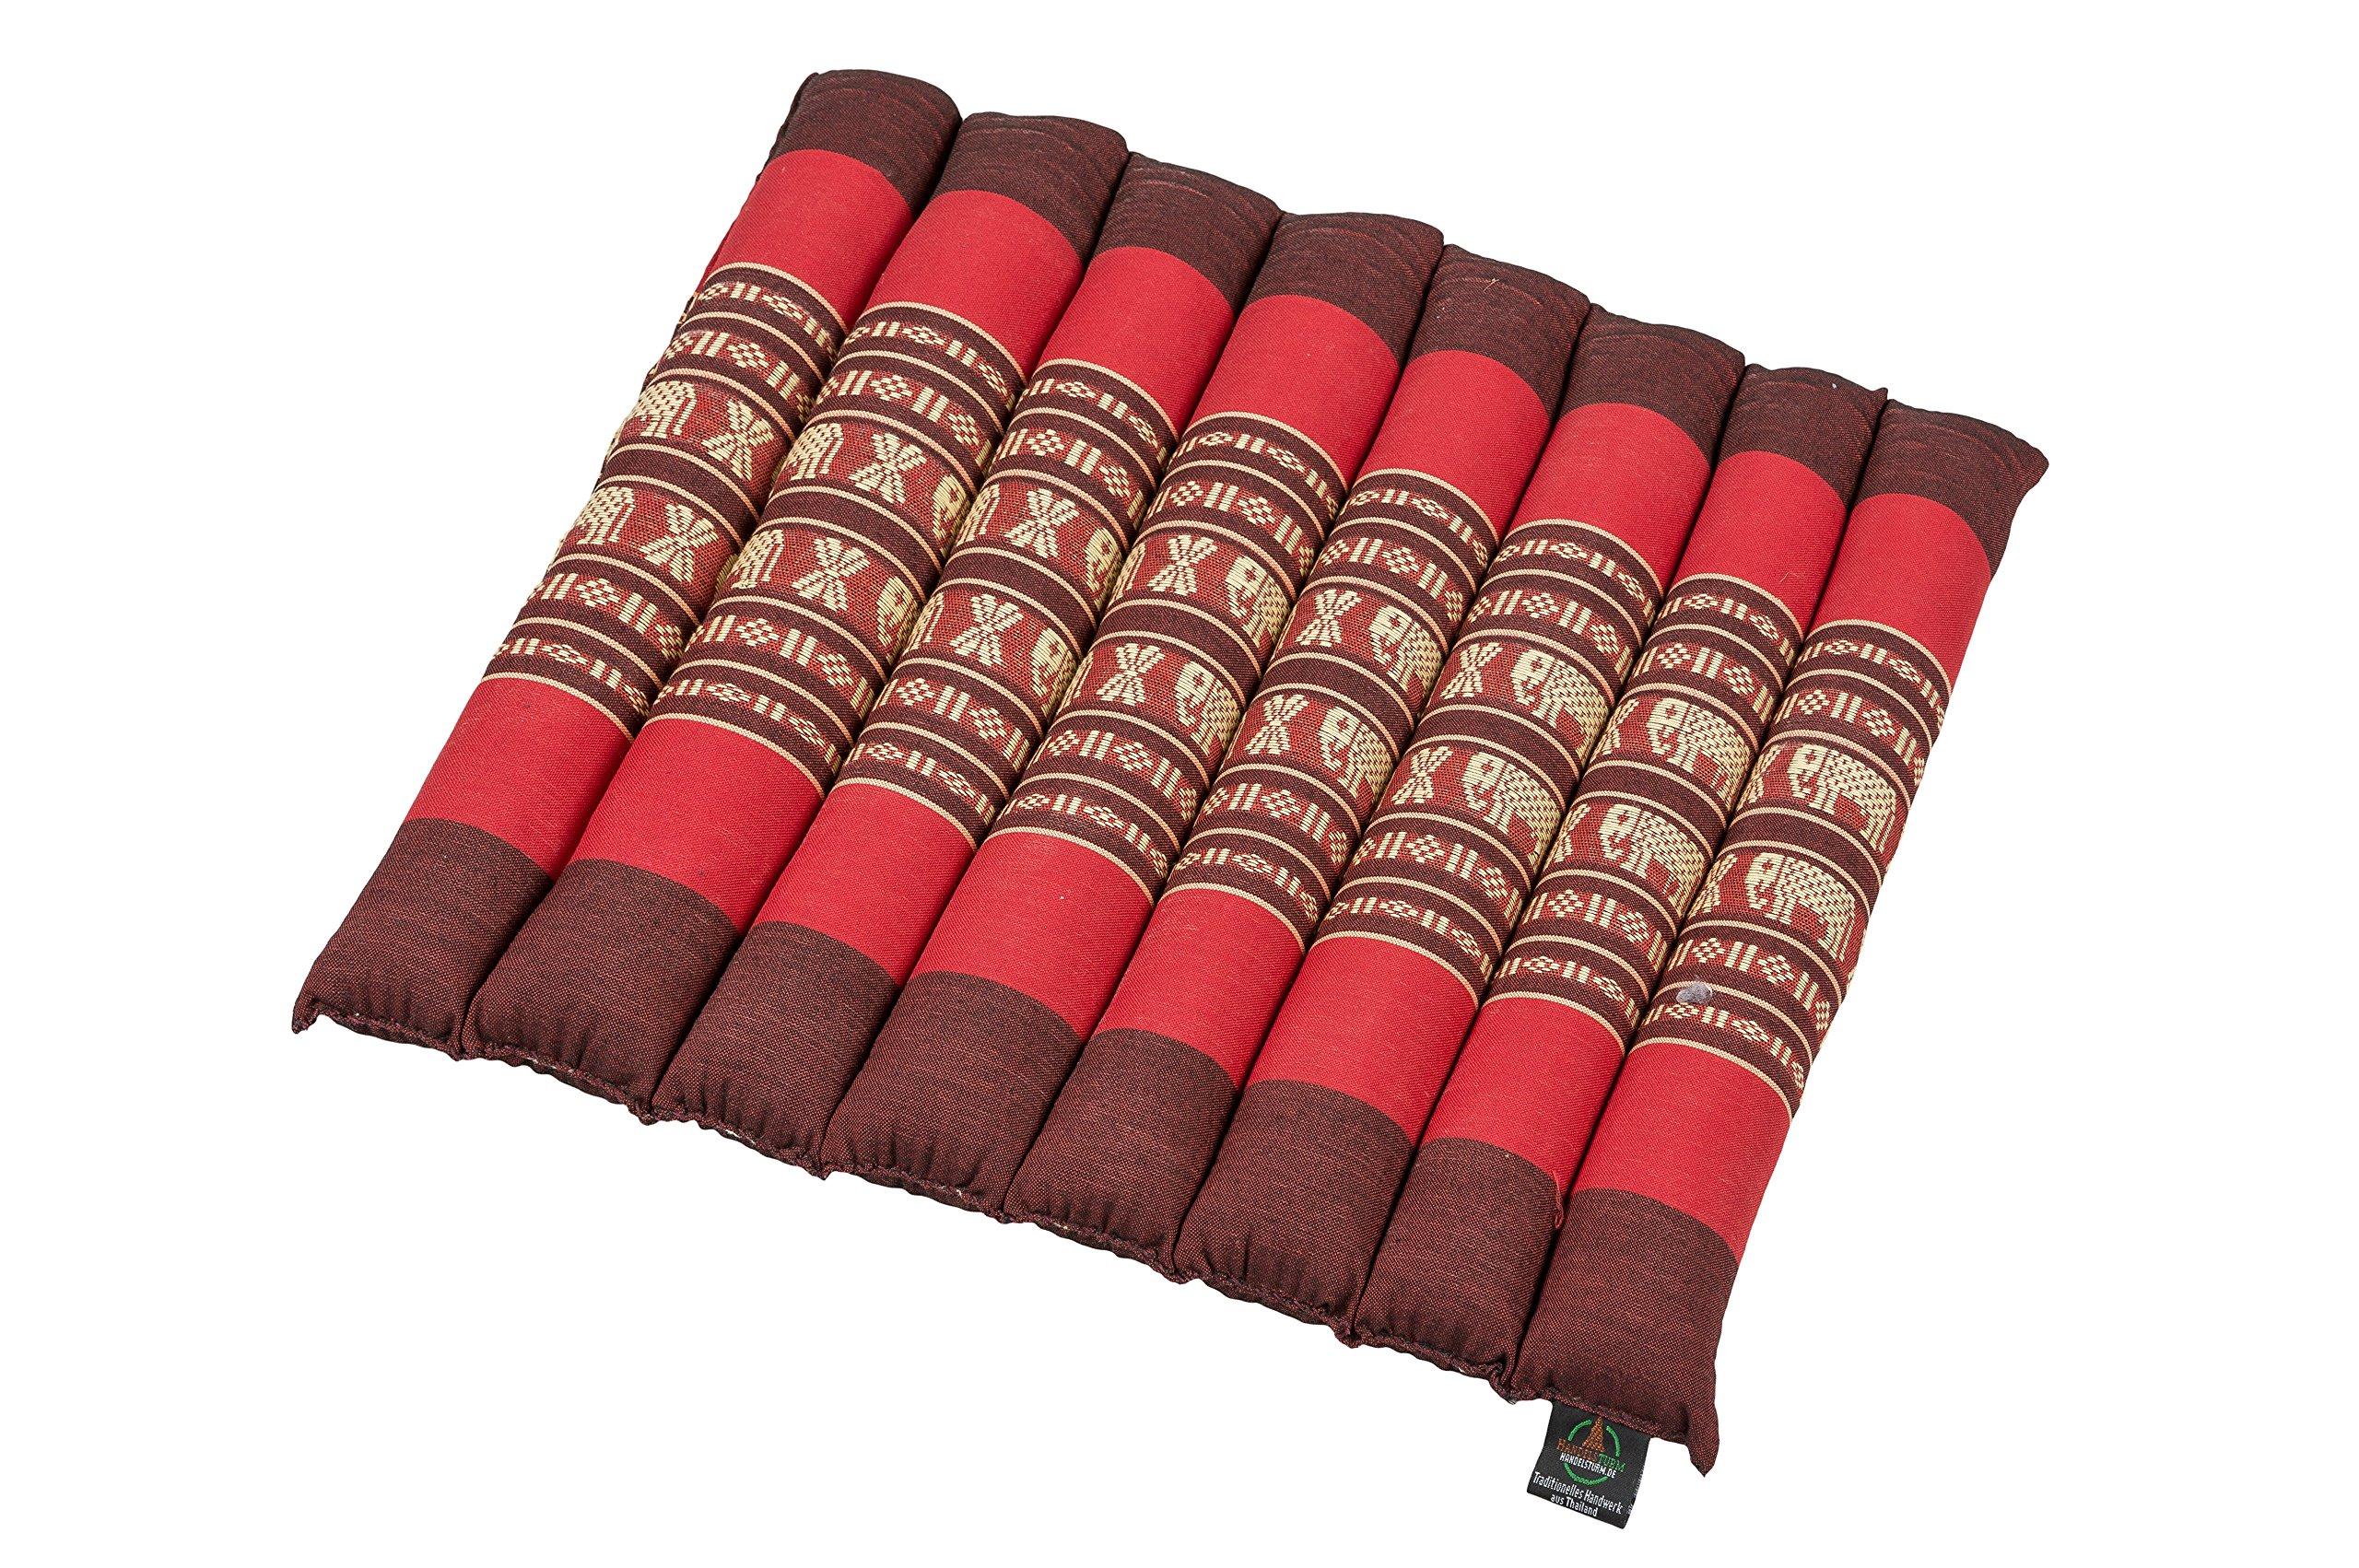 Kapok Dreams Seat Cushion 15''x16'', Firm Durable, Multicolor Chair Pad Red Elephant Thai Design, 100% Natural Kapok Filling!